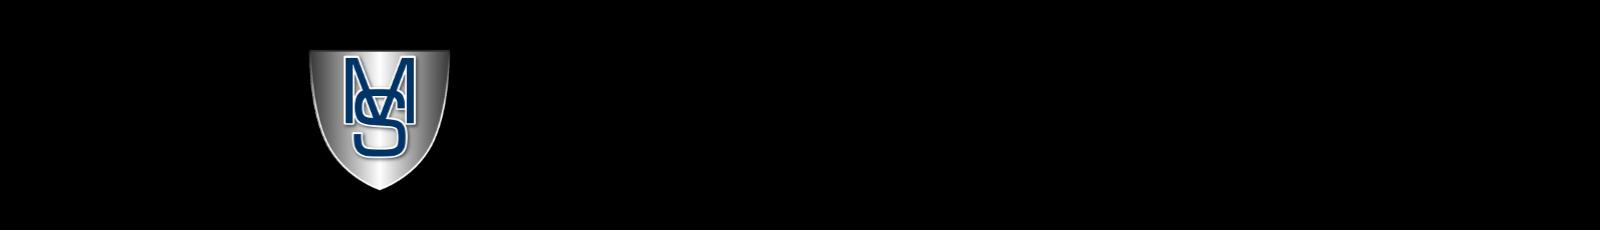 Der WLAN Ratgeber Logo